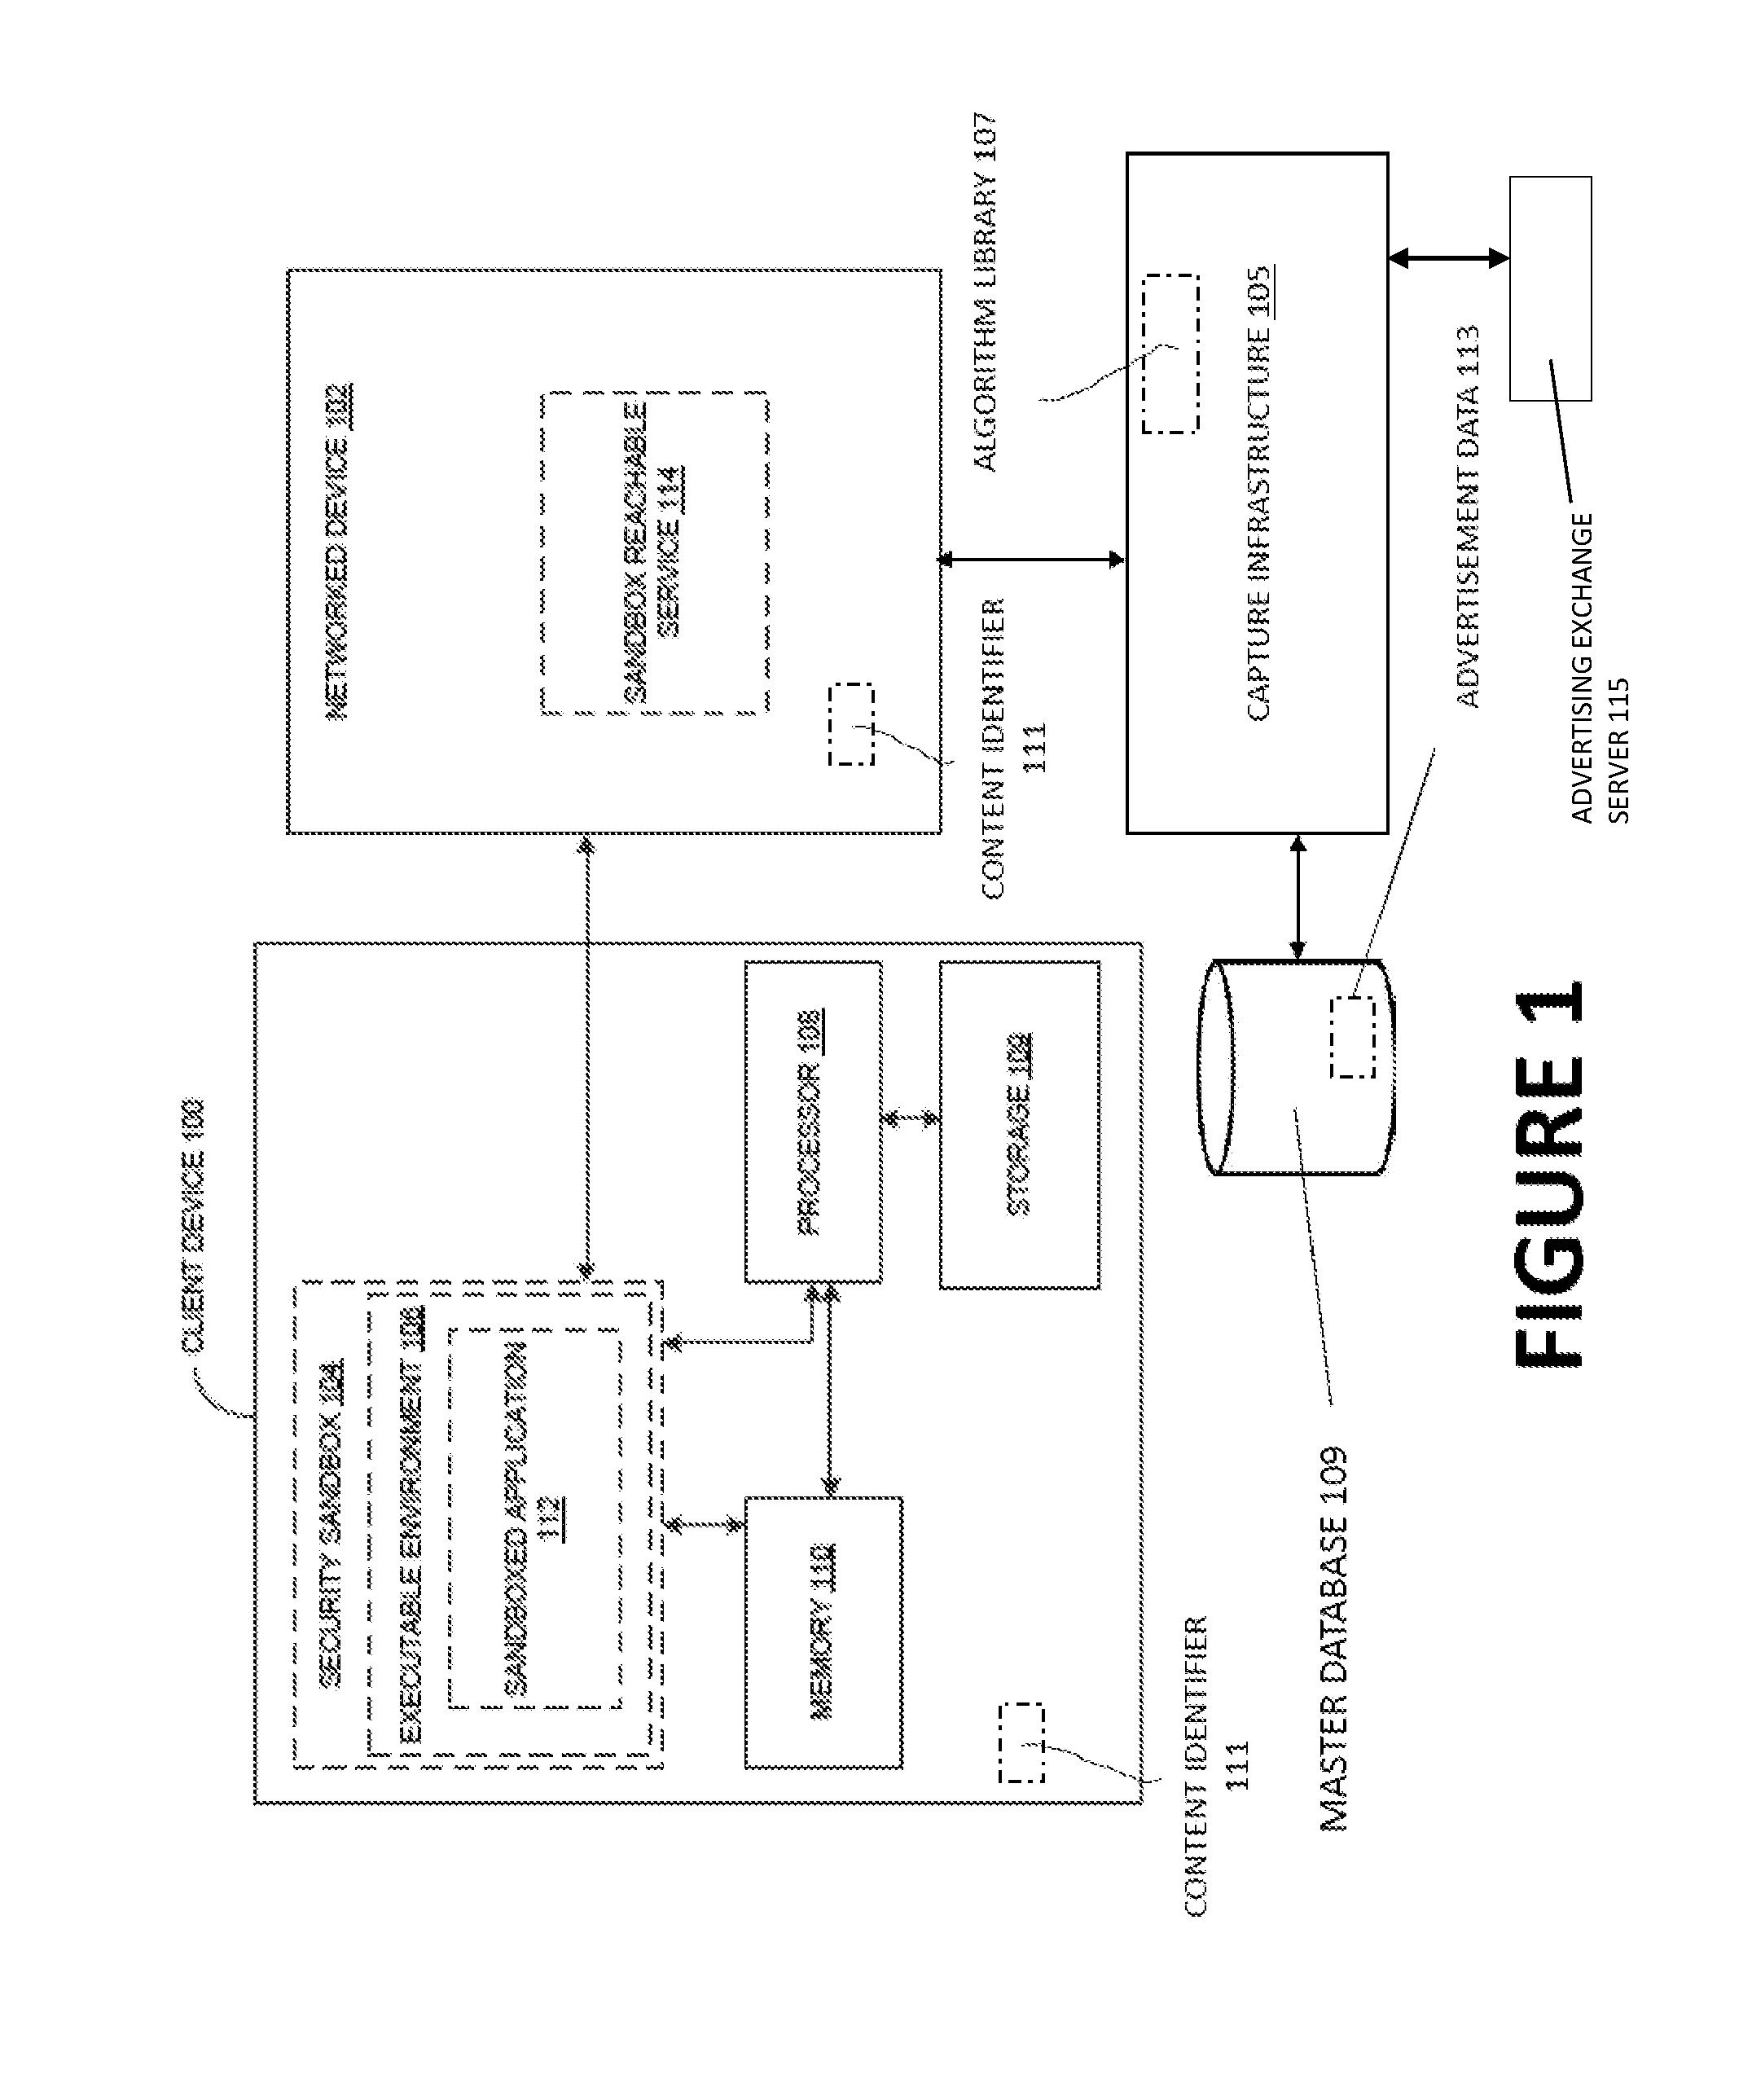 Patent US 10,032,191 B2